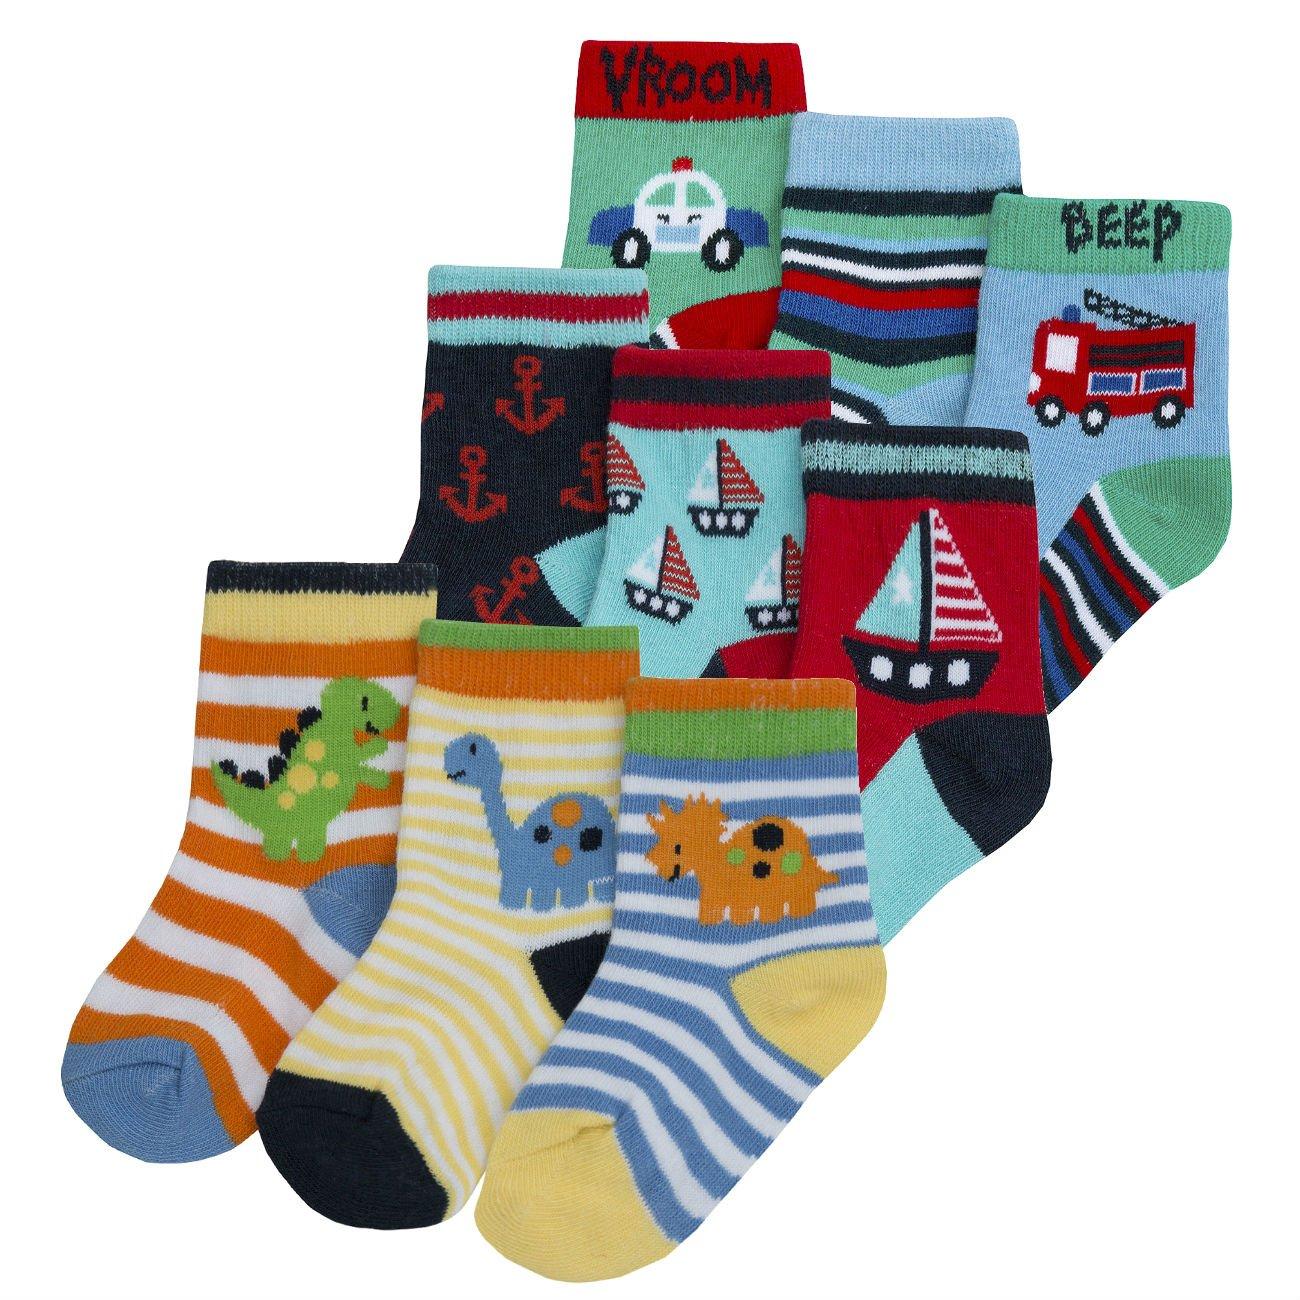 Baby Boys Novelty Socks - Cotton Rich (9 or 18 Pair Multipack) Ankle Metzuyan LTD